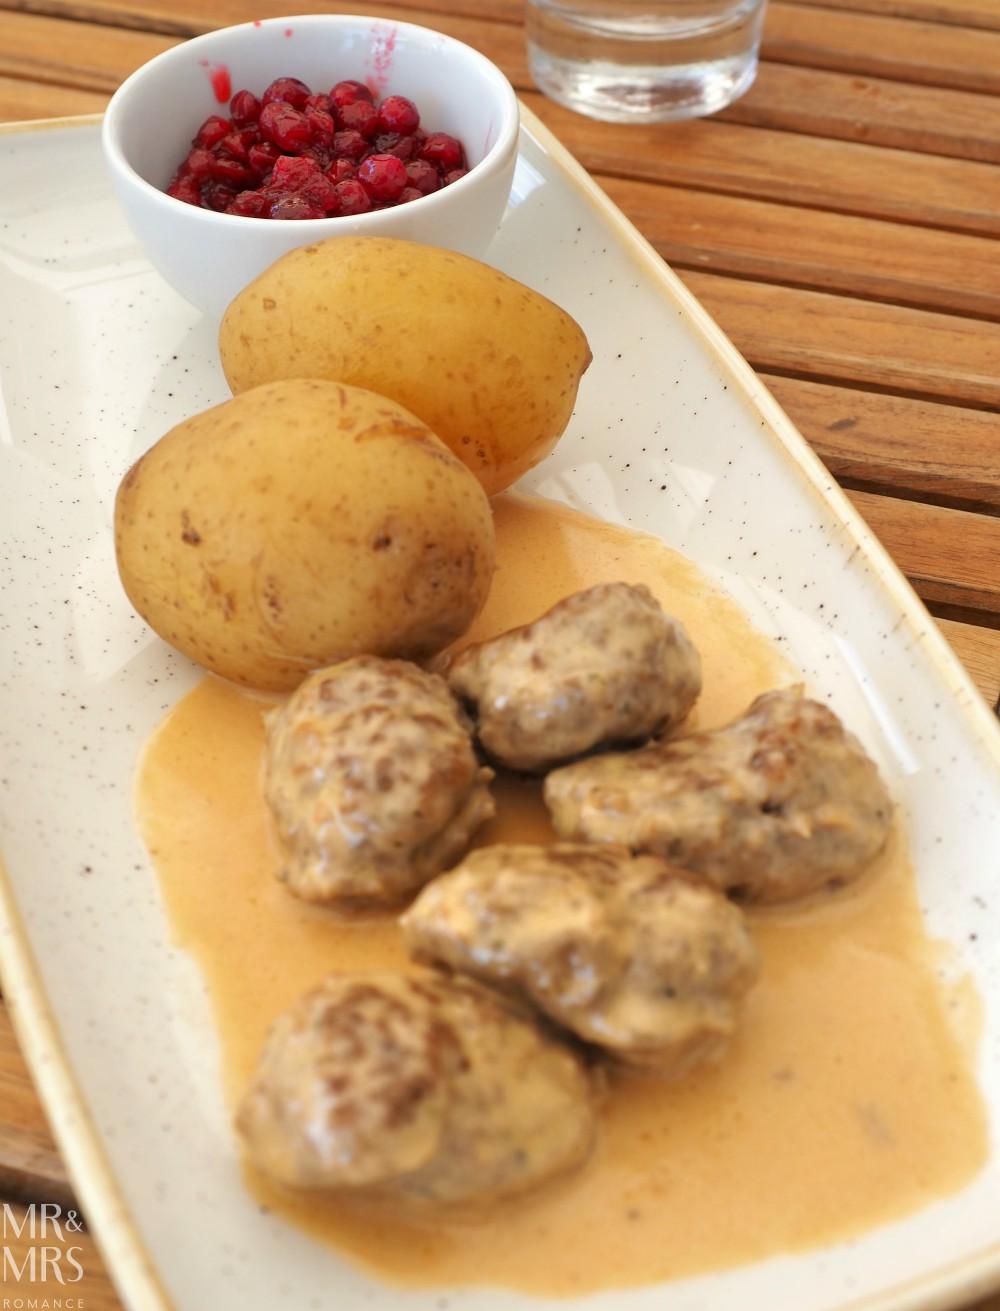 Swedish food - meatballs